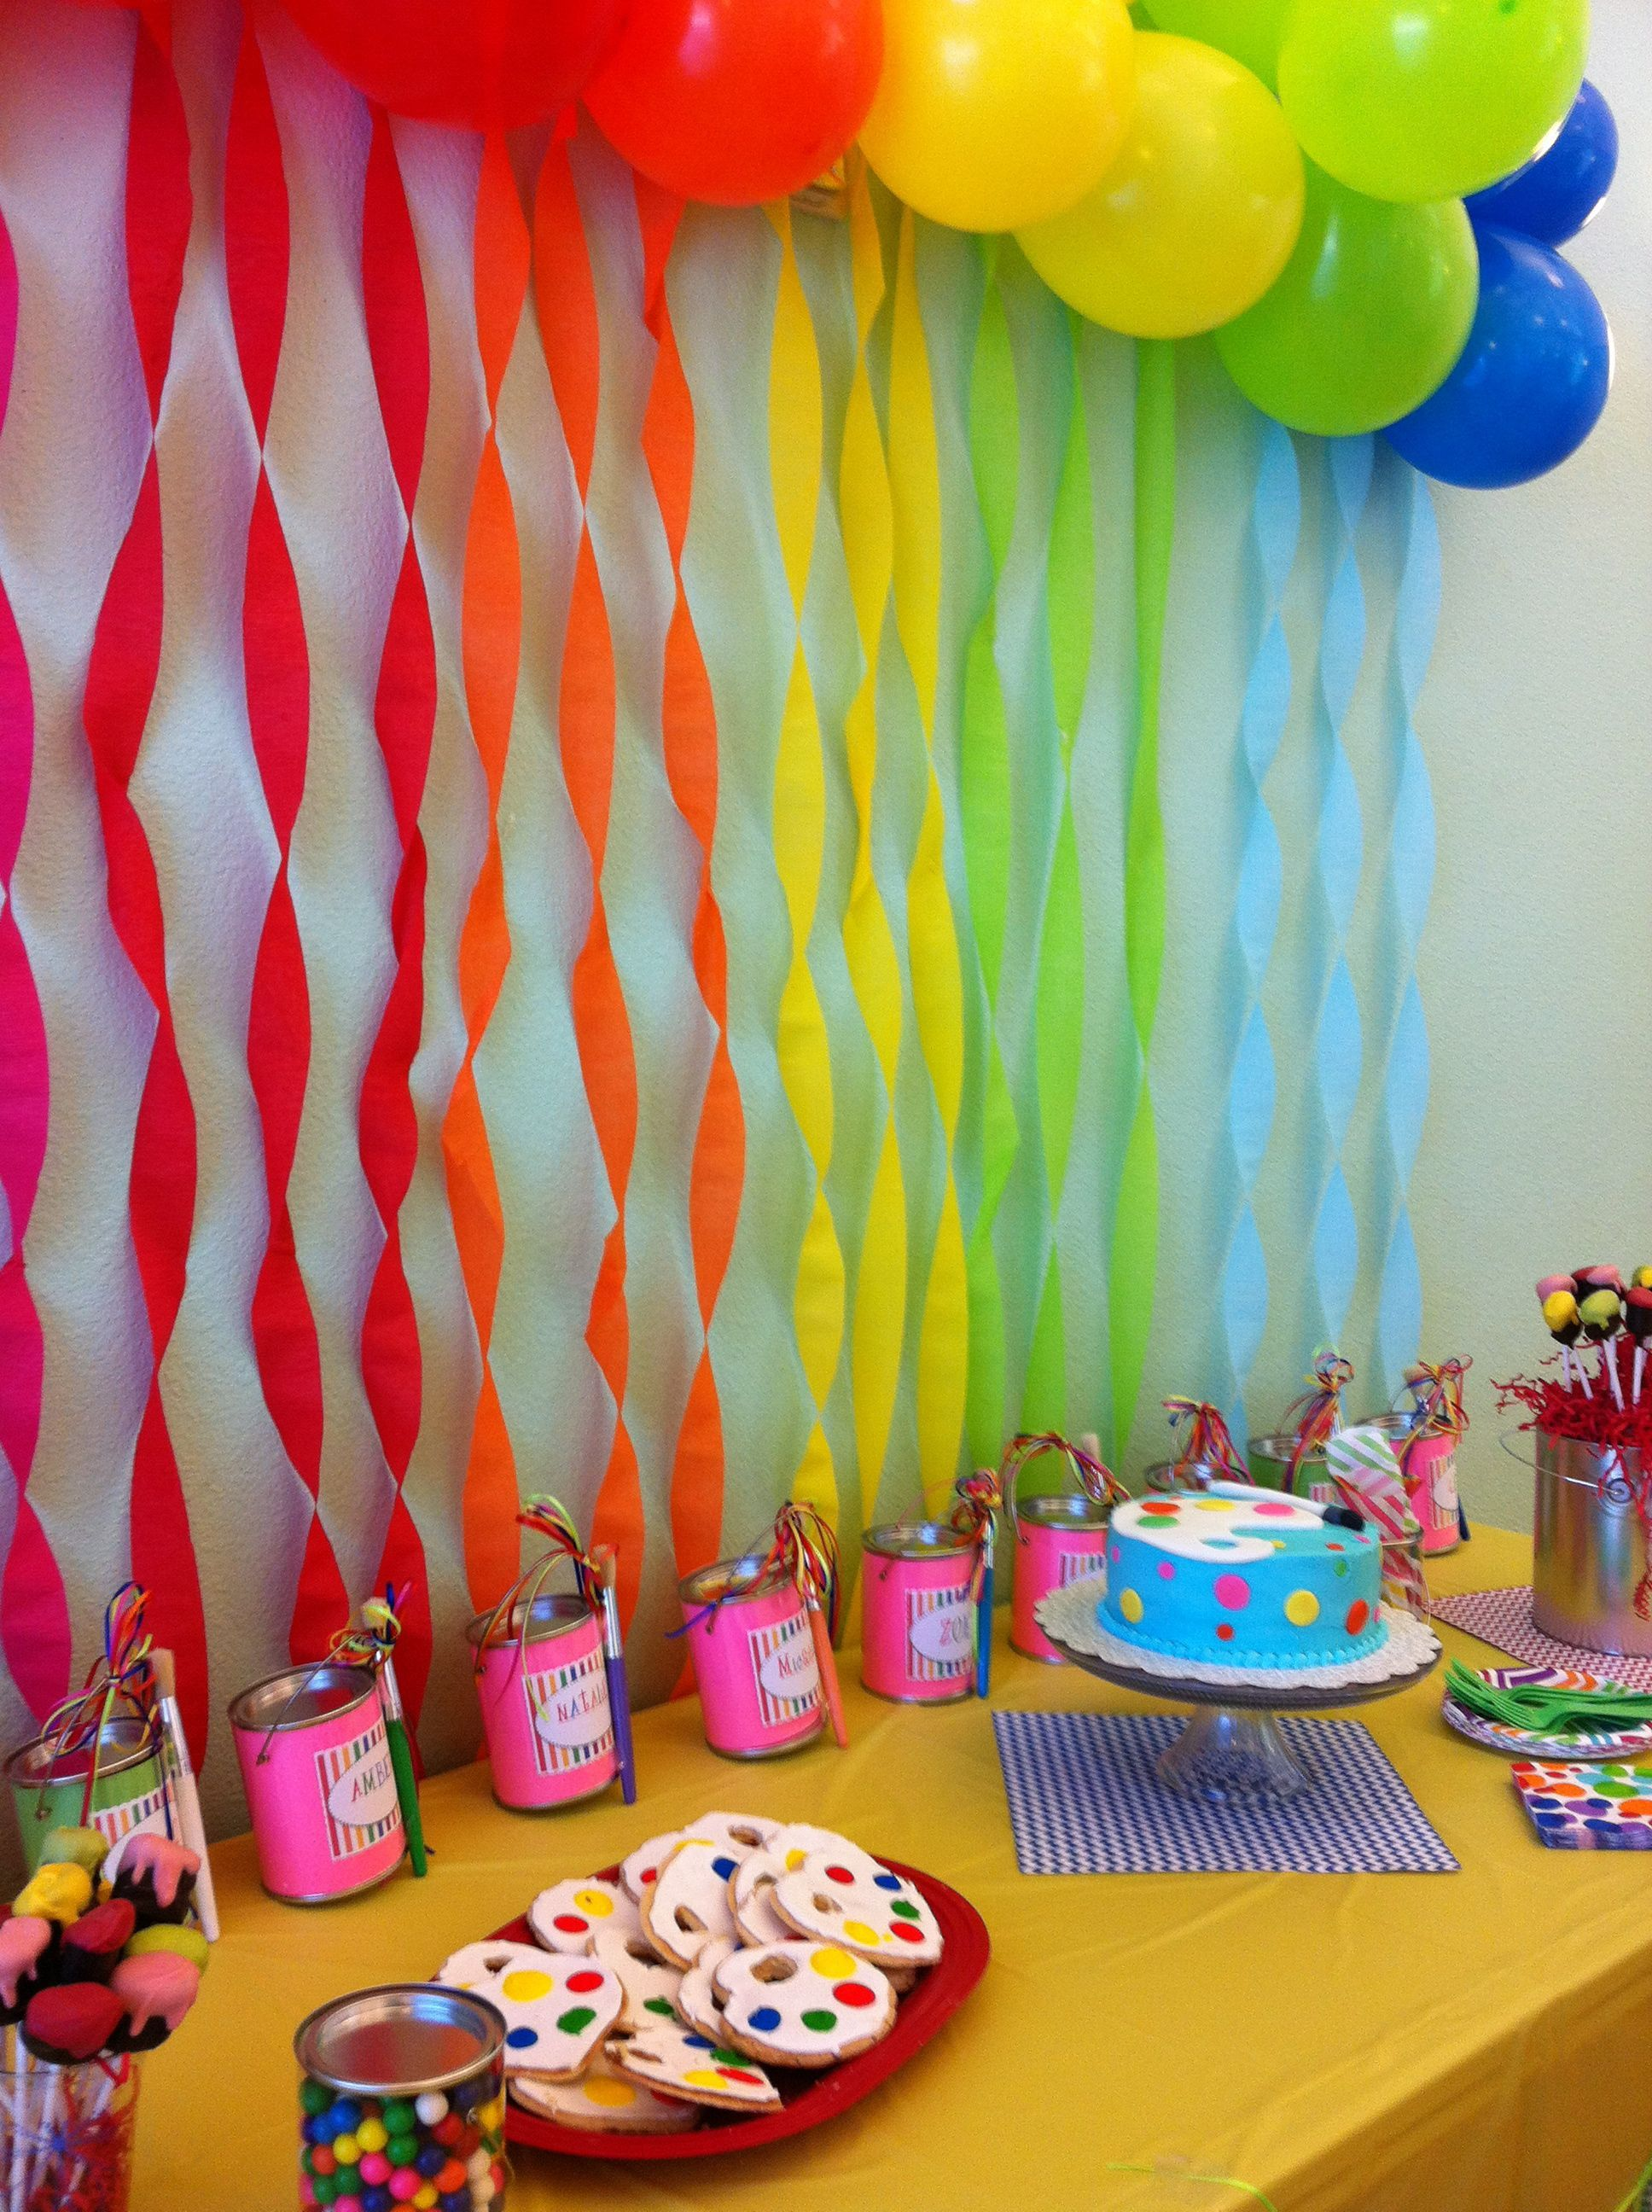 11 Year Old Girl Birthday Party Ideas Art Birthday Party Artist Birthday Party Painting Birthday Party